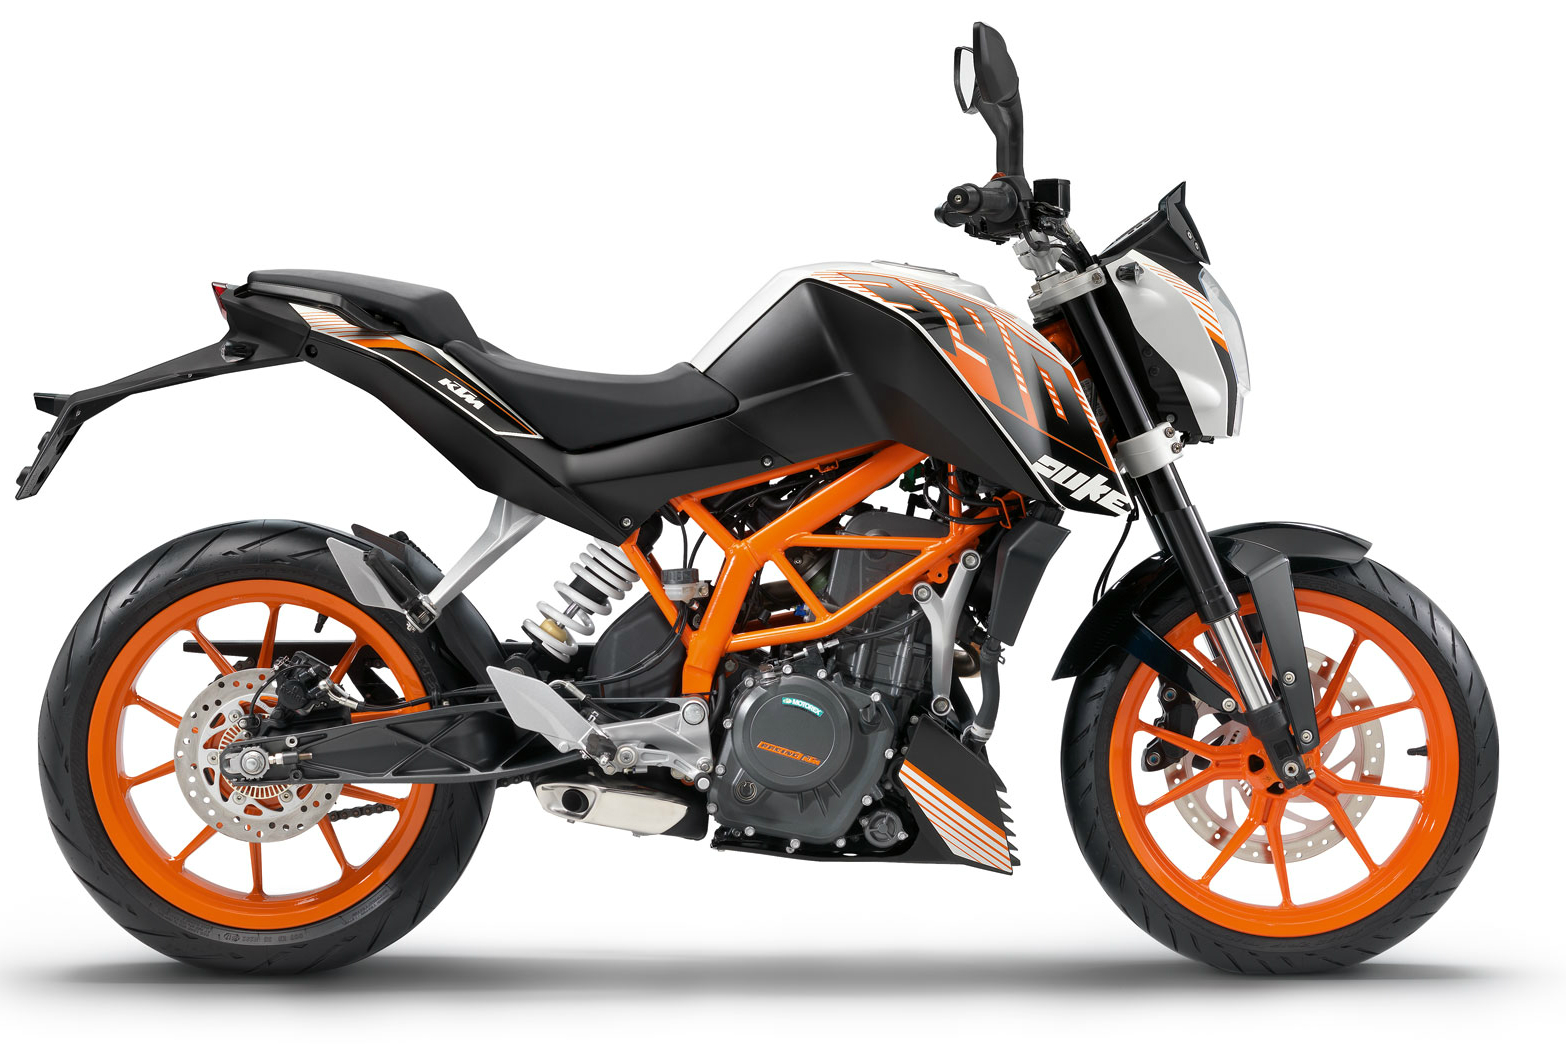 Top 10 Brand New Bikes Under 500cc Visordown